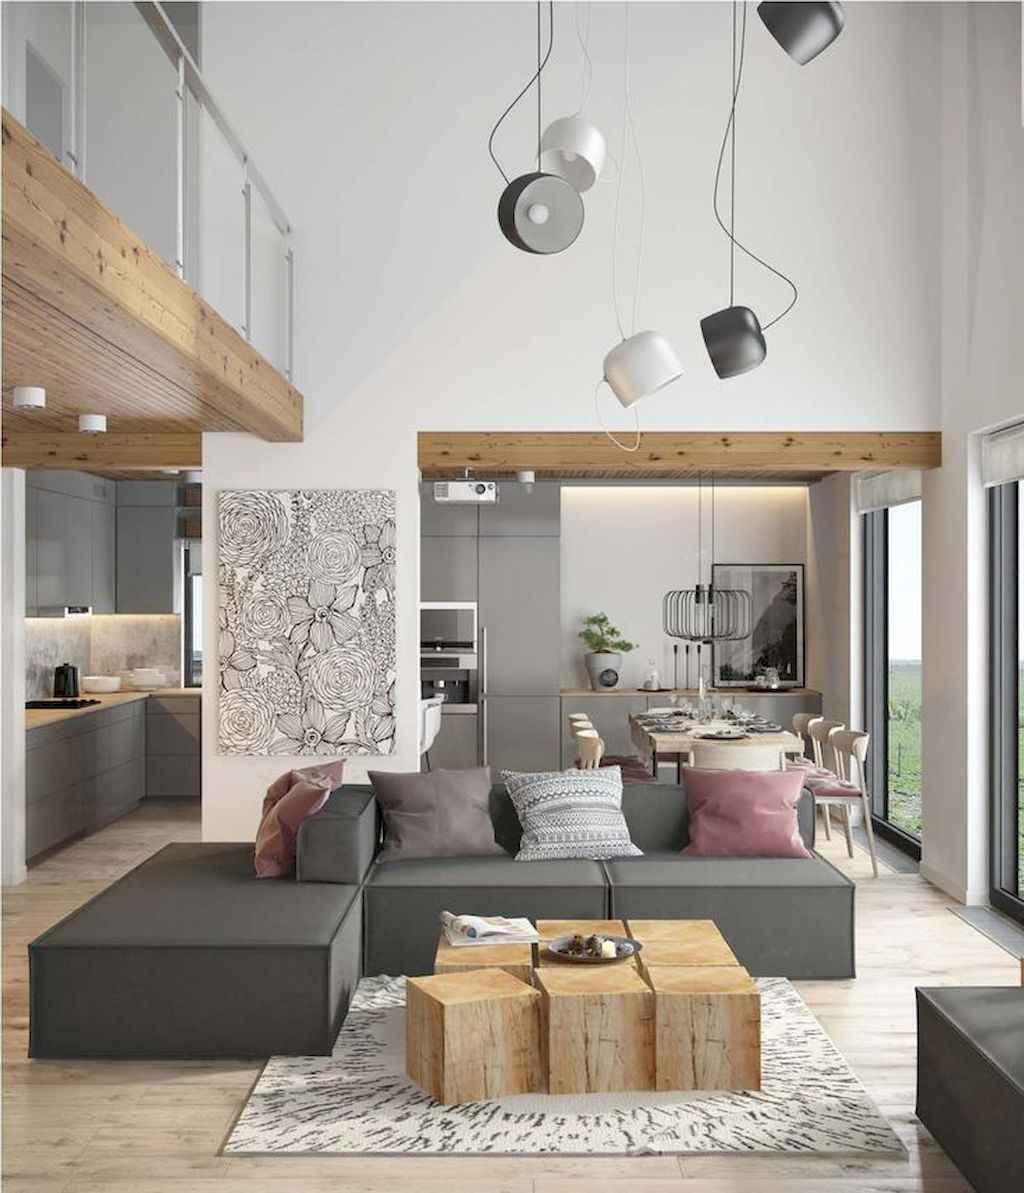 20 Contemporary Living Room Ideas Decorations (11)